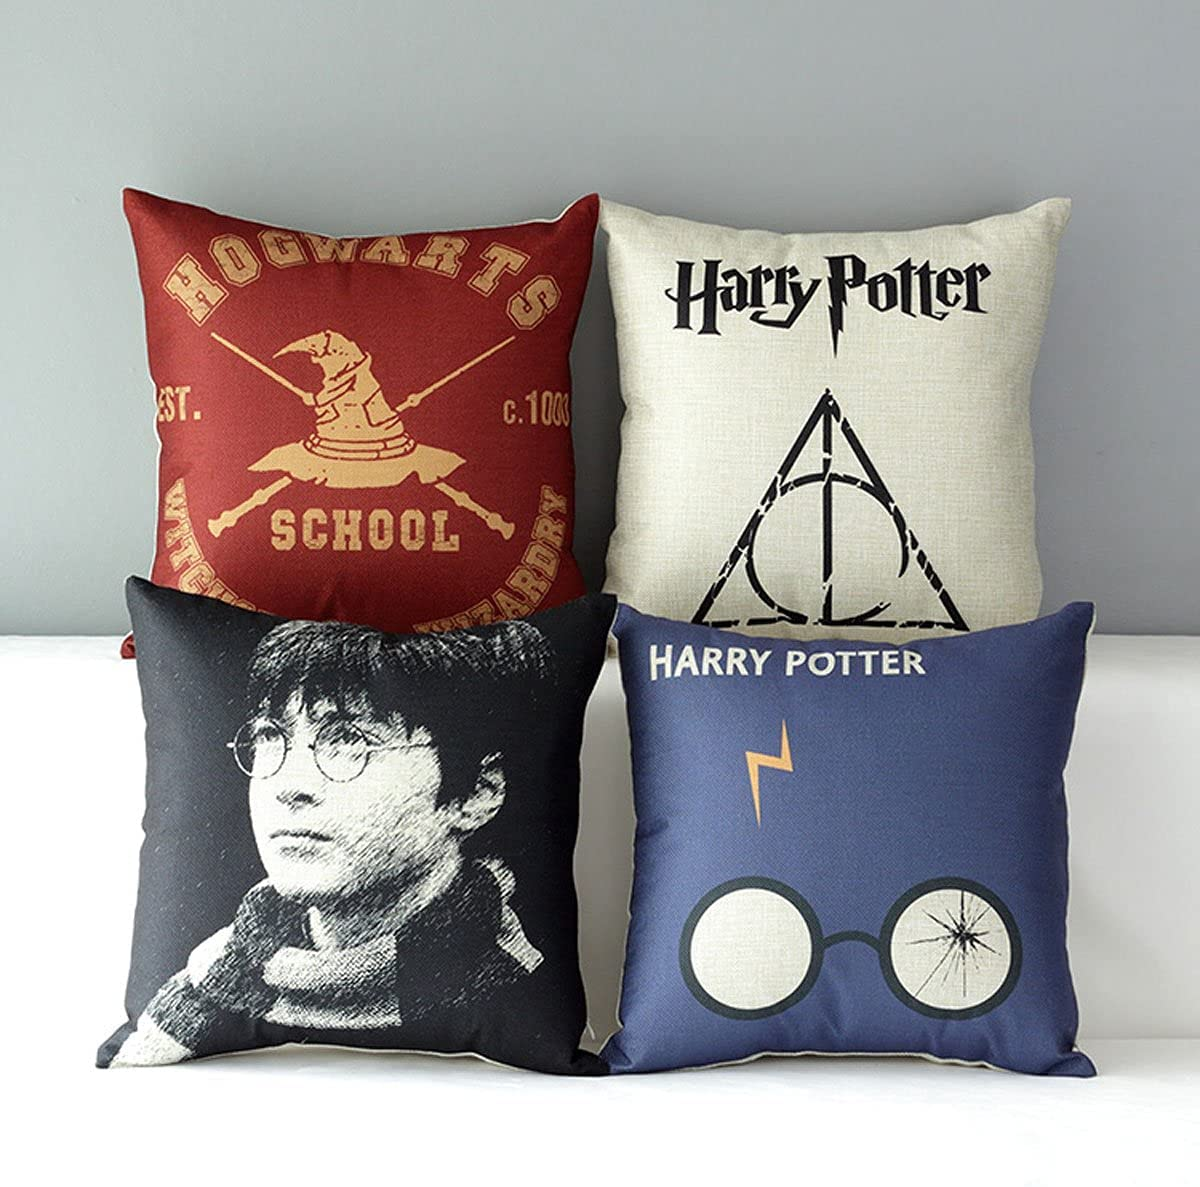 5. Harry Potter Pillow Set